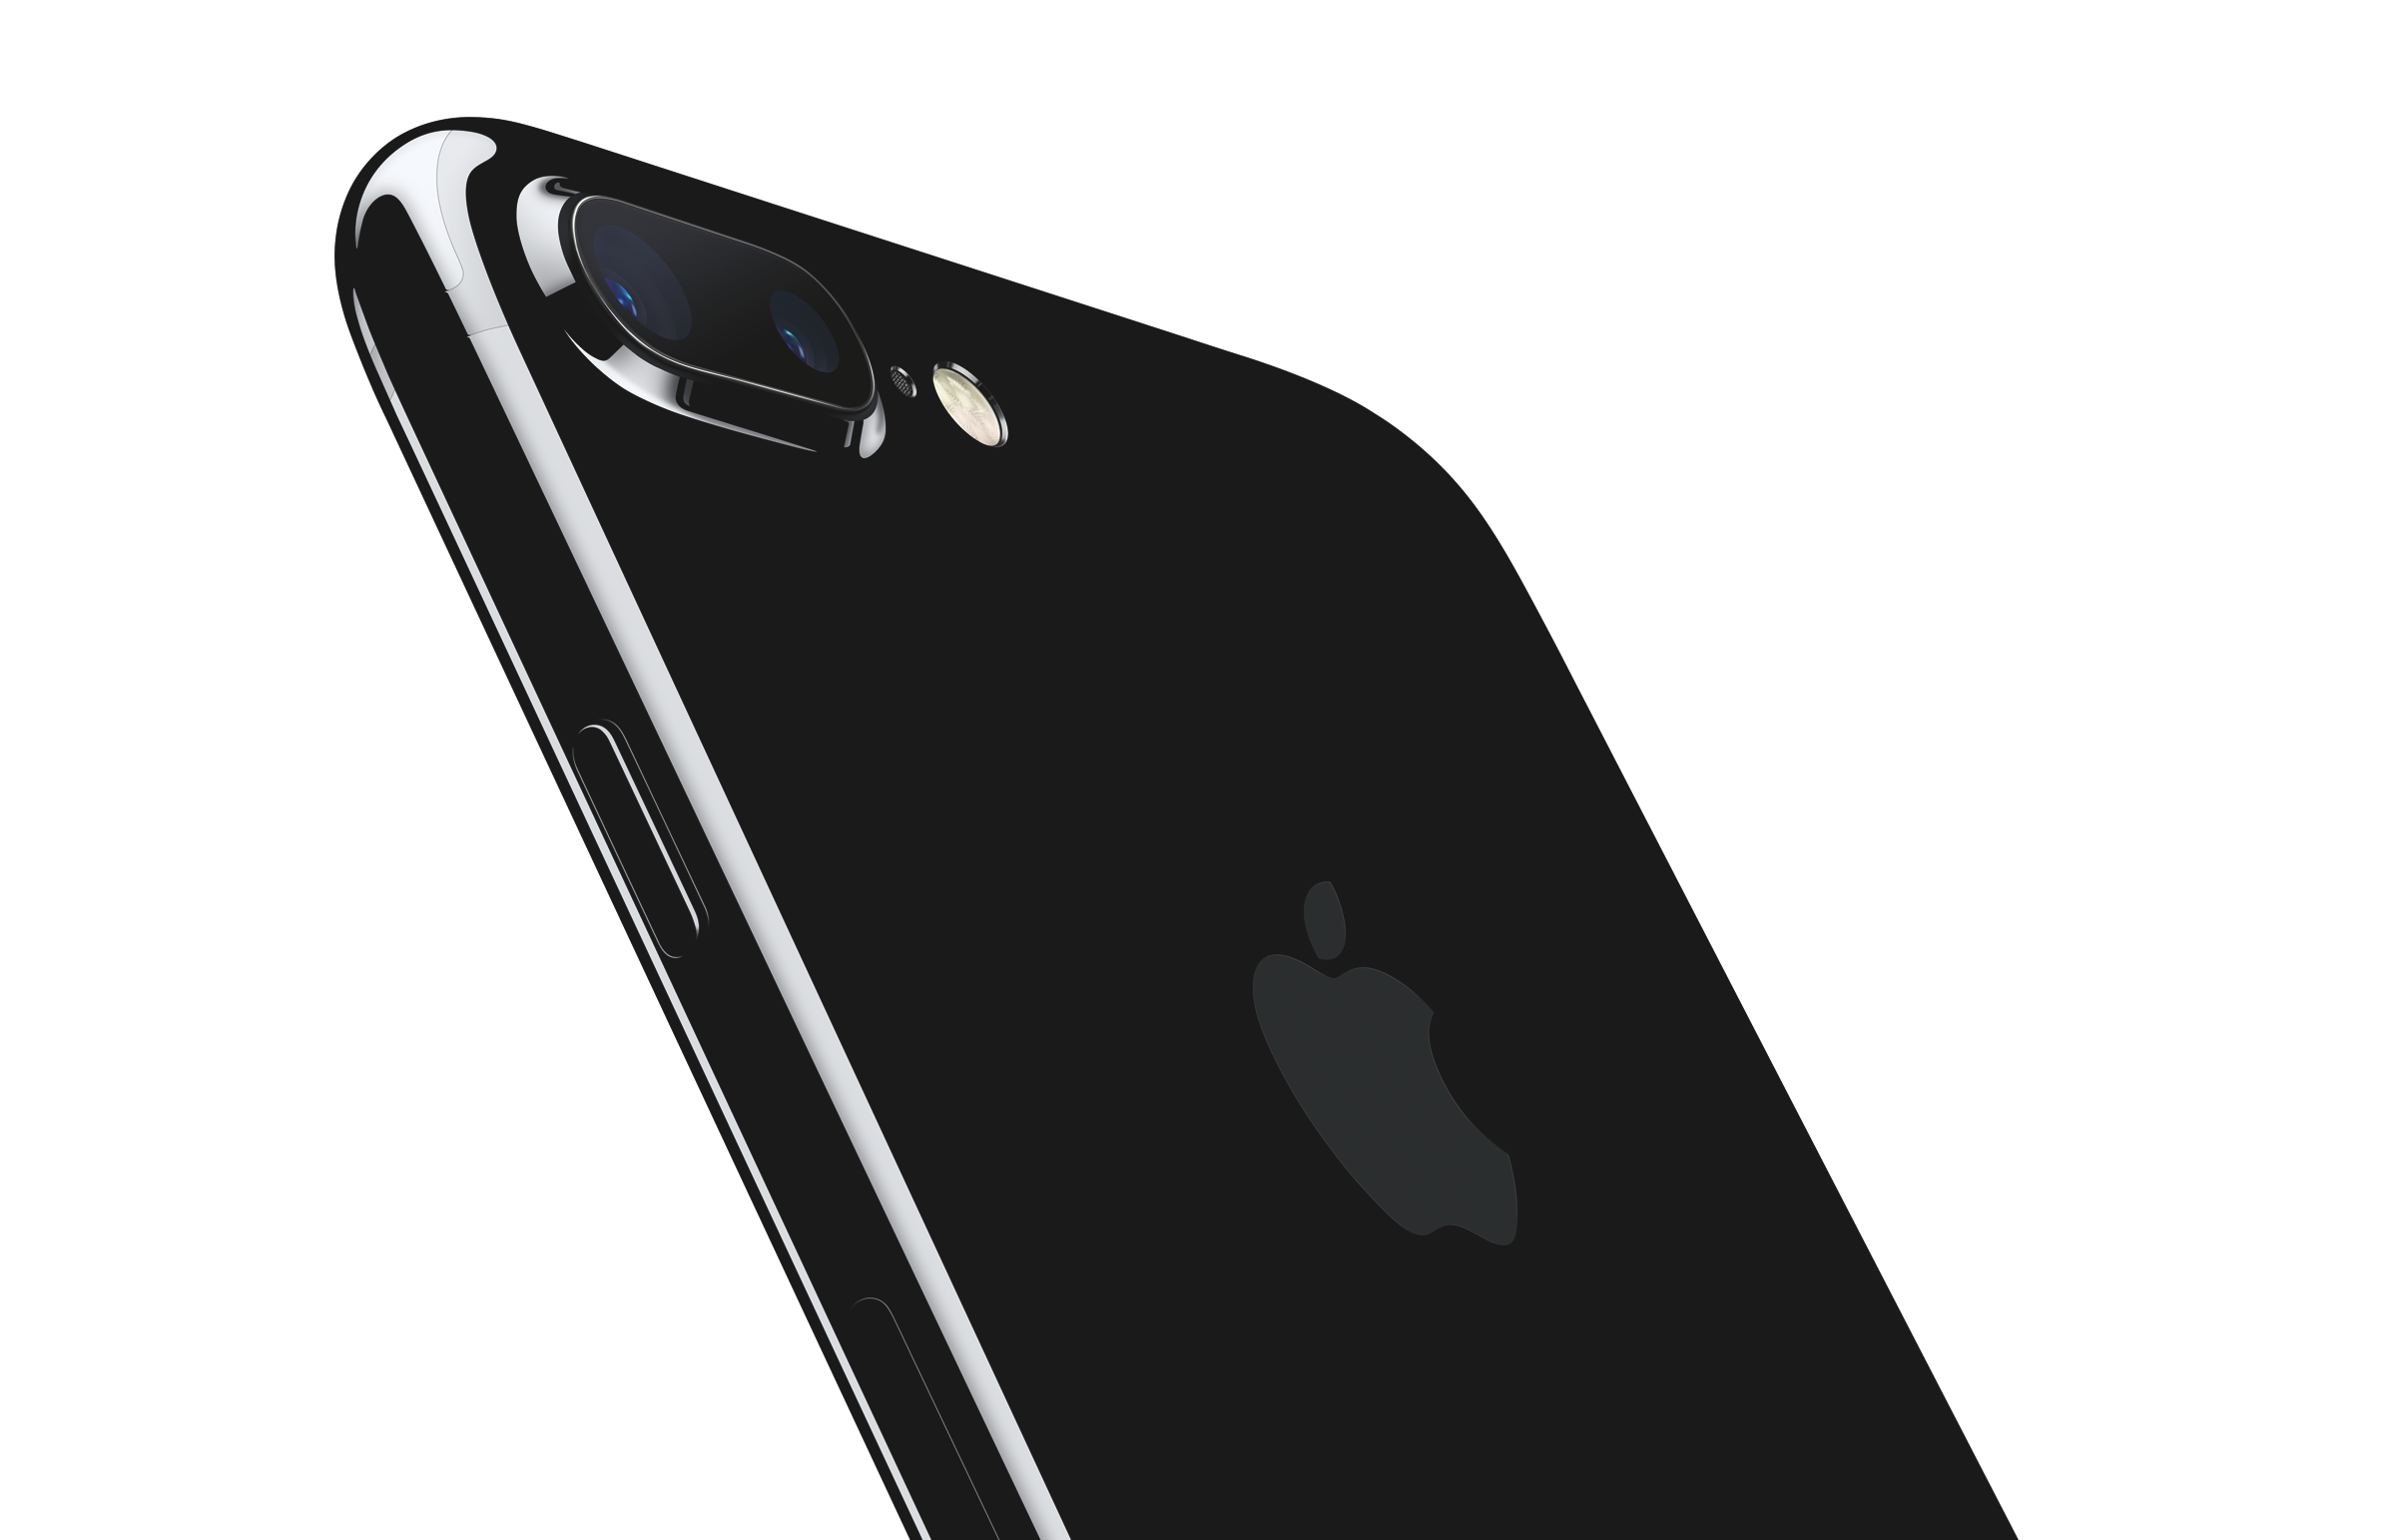 Iphone 7 Plus Jet Black Wallpaper Hd Vinny Oleo Vegetal Info